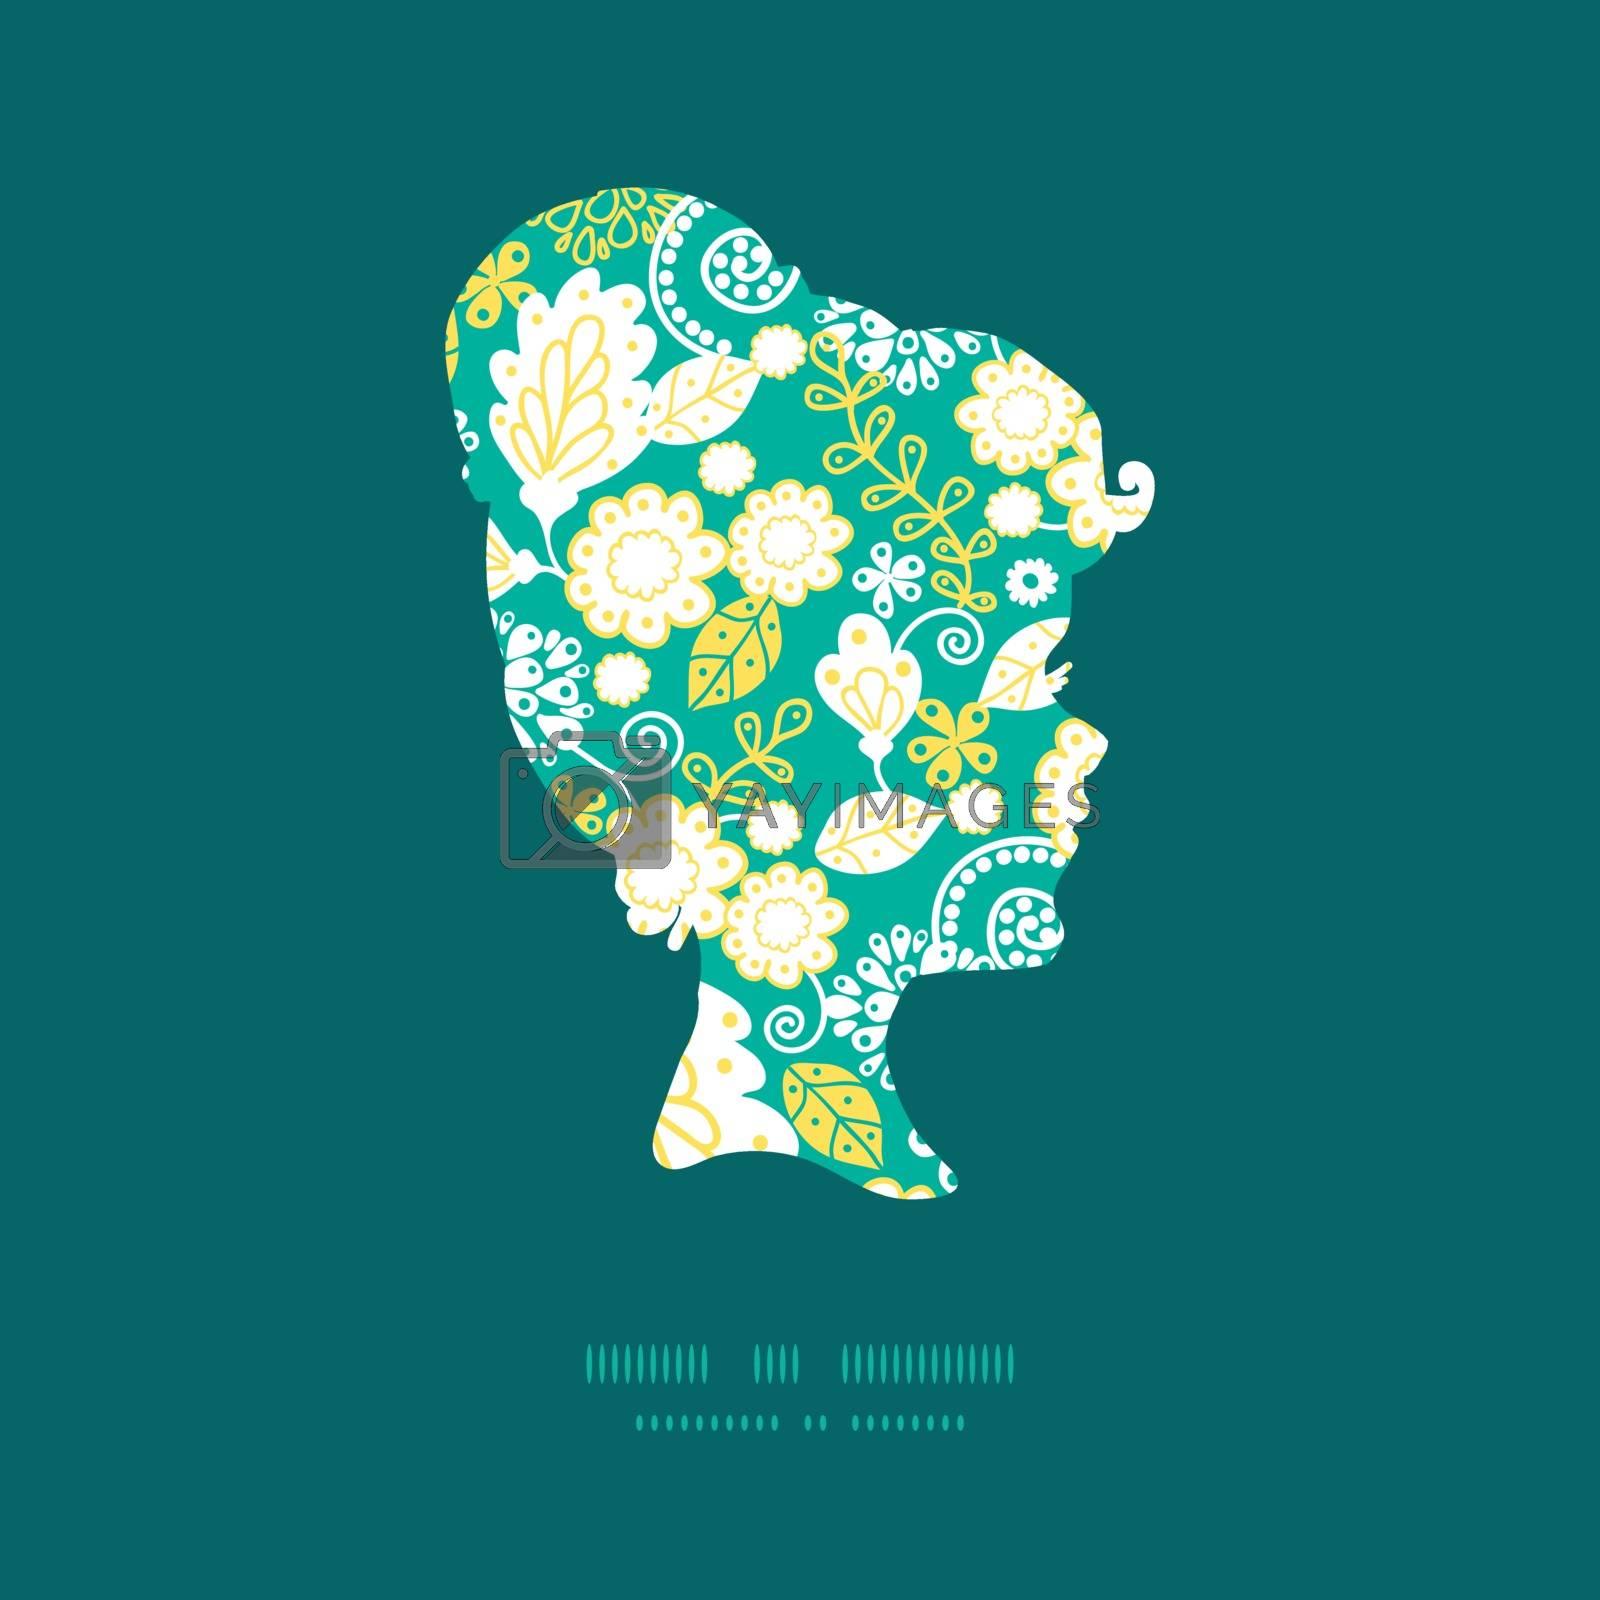 Vector emerald flowerals girl portrait silhouette pattern frame graphic design